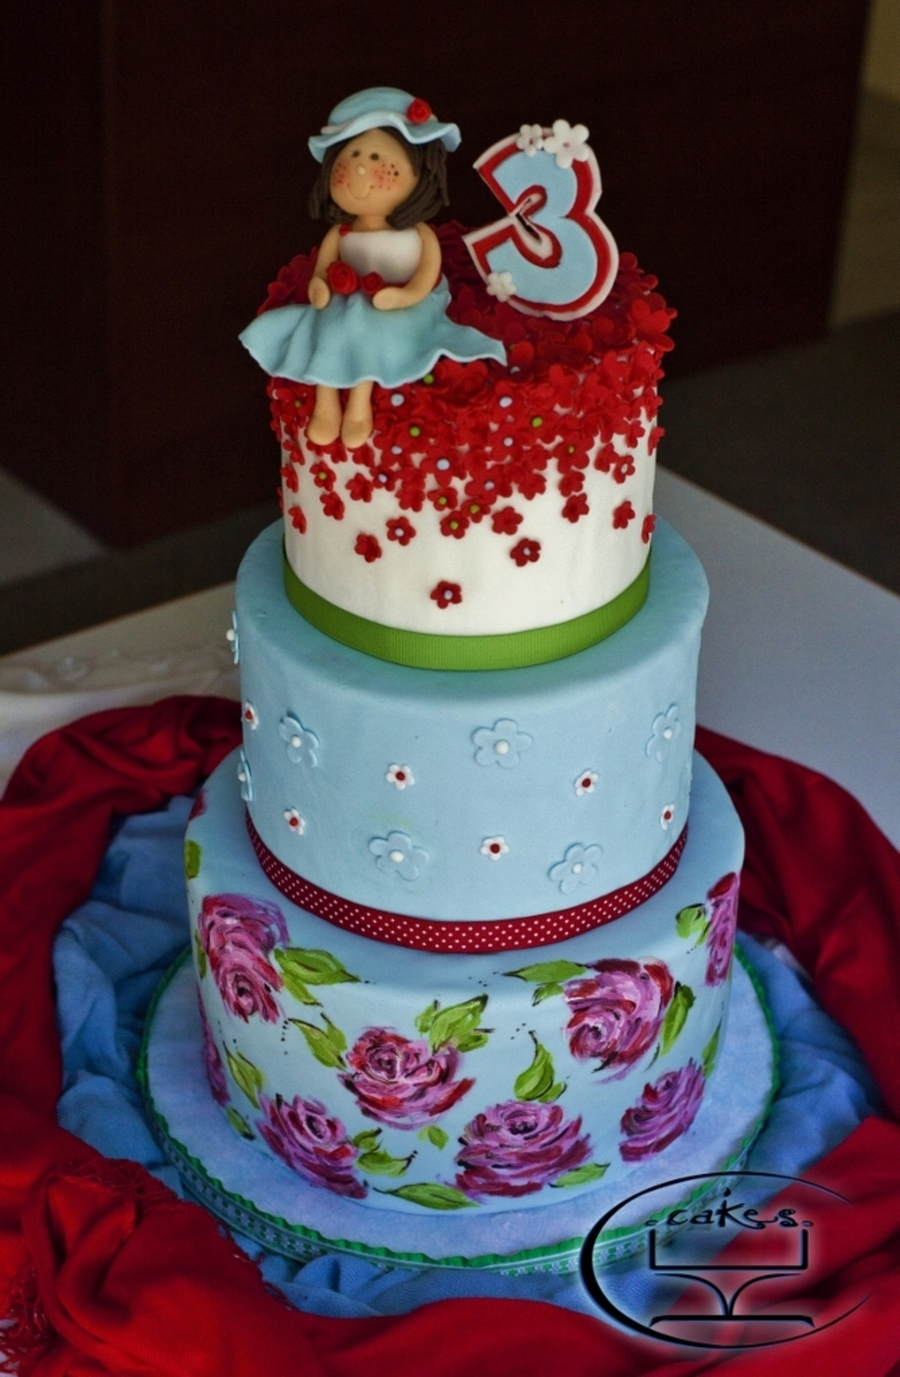 Birthday Cakes For Girls Turning 9